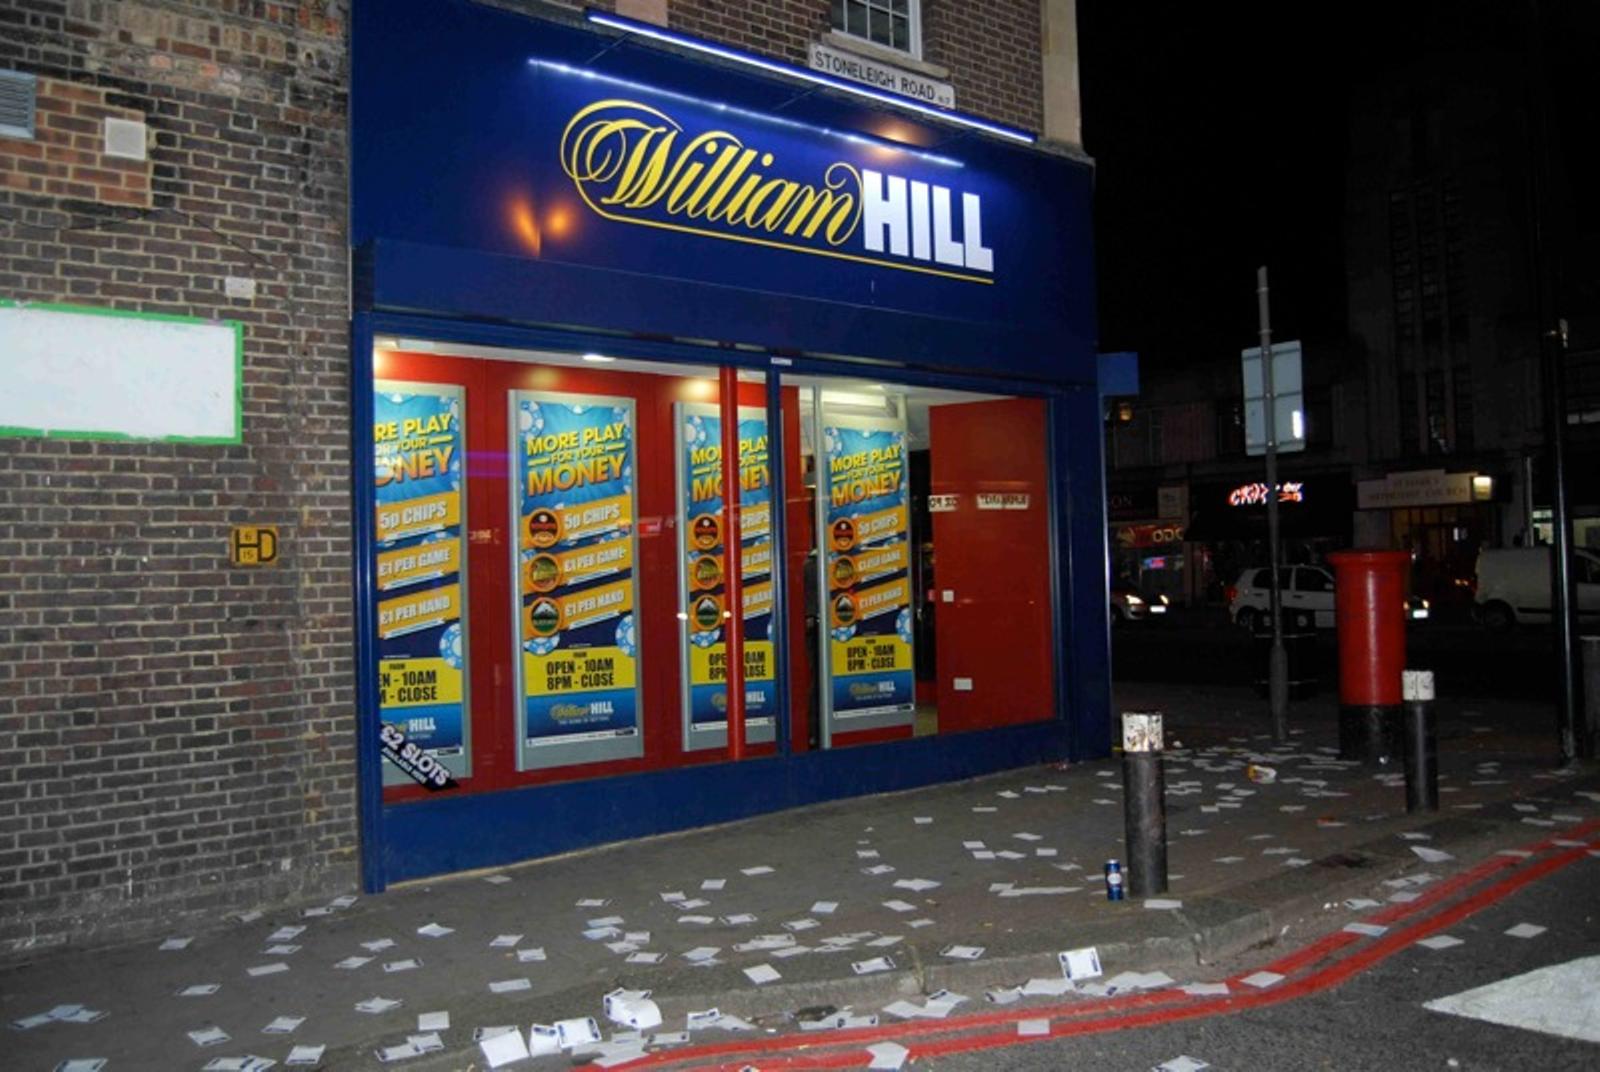 William Hill, Wettbüro